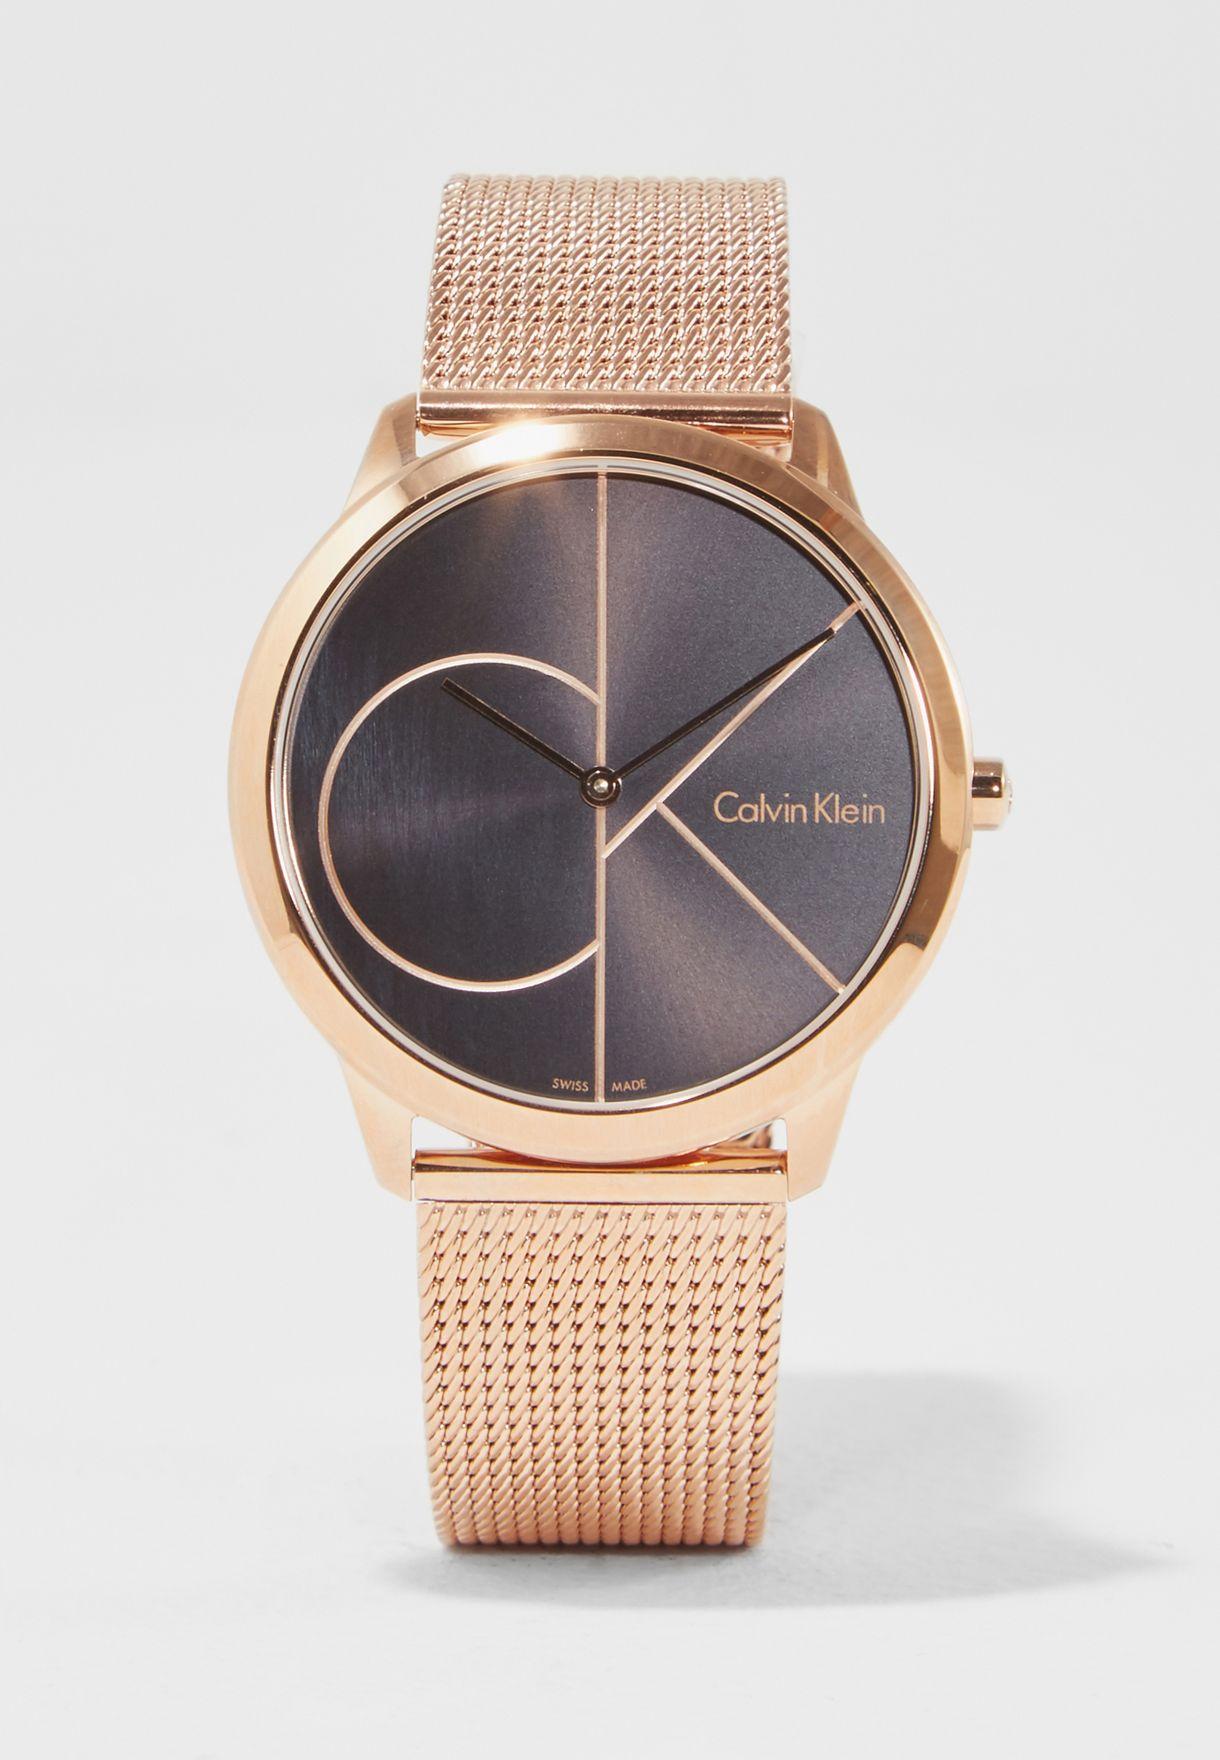 364f40e13 تسوق ساعة عصرية ماركة كالفن كلاين لون ذهبي K3M216-21 في الامارات ...